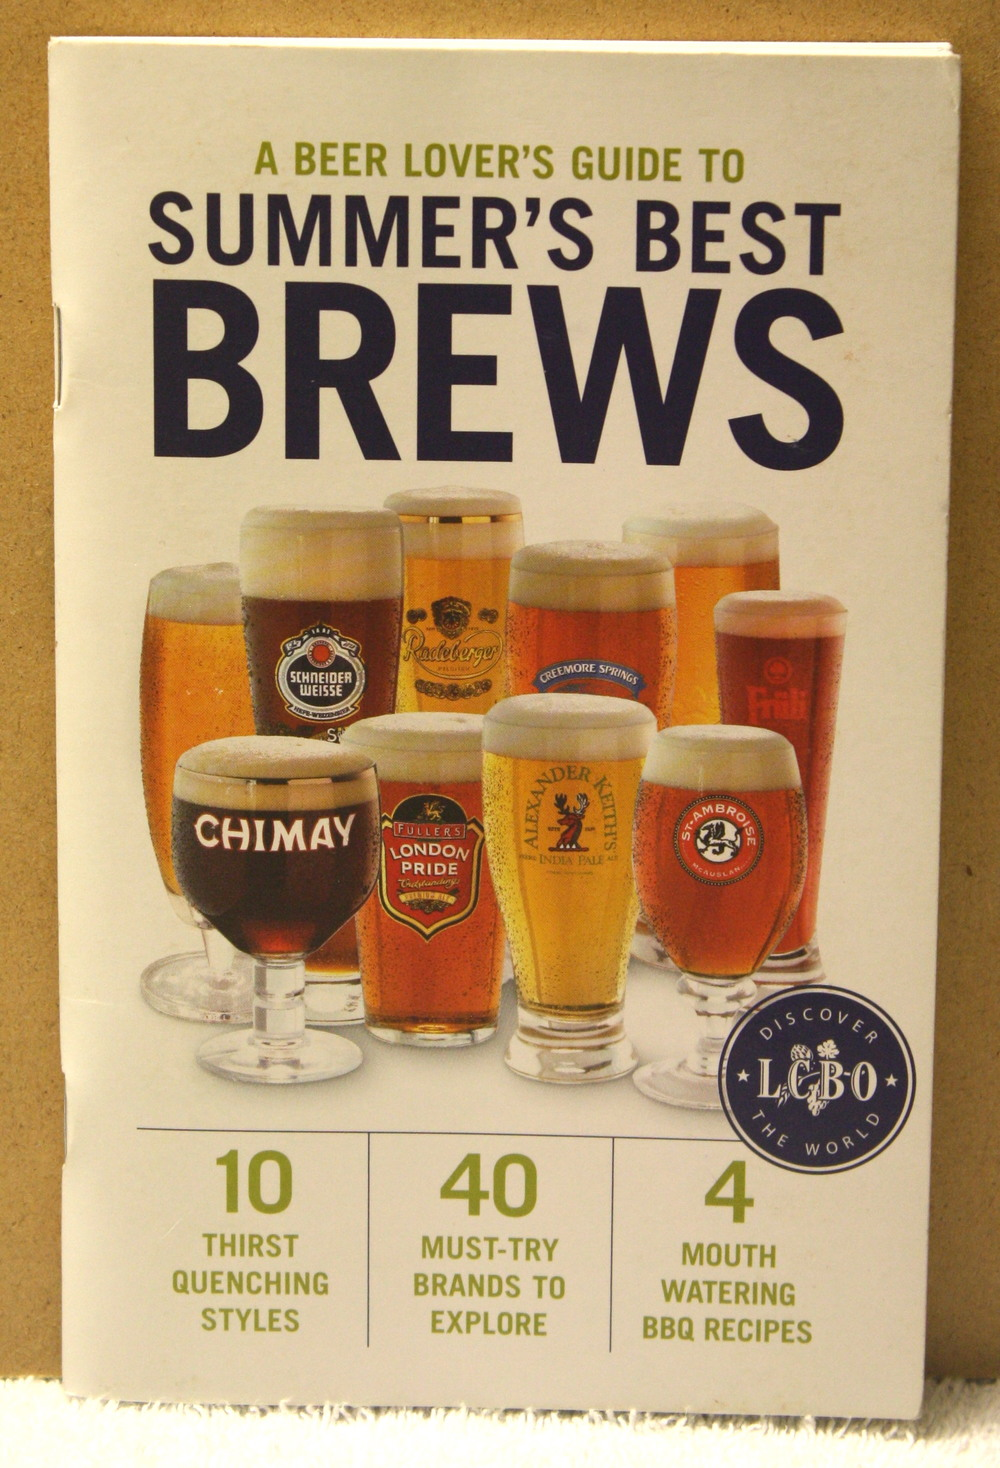 Summer's Best Brews (Summer 2009)